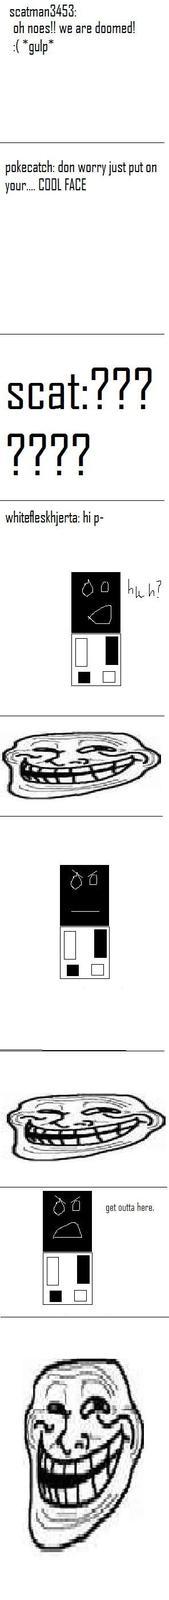 troll_cartoon.jpg